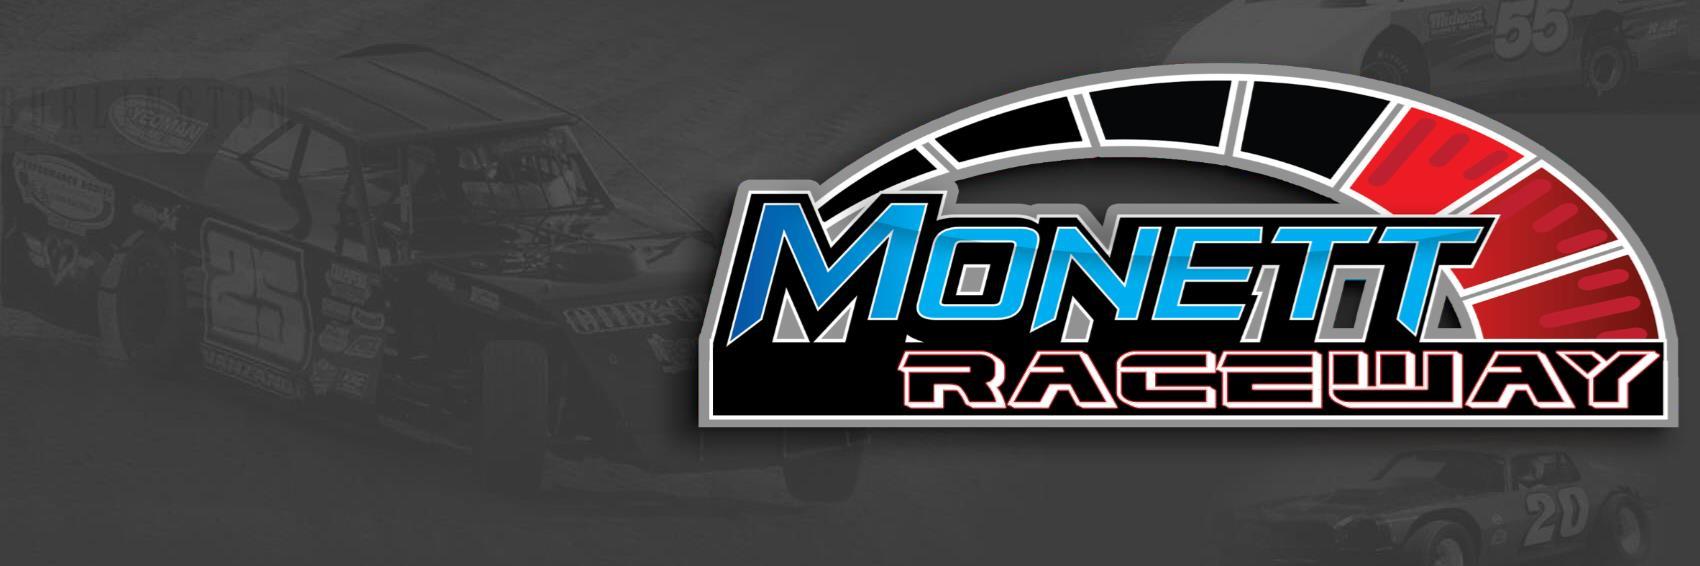 9/11/2021 - Monett Motor Speedway